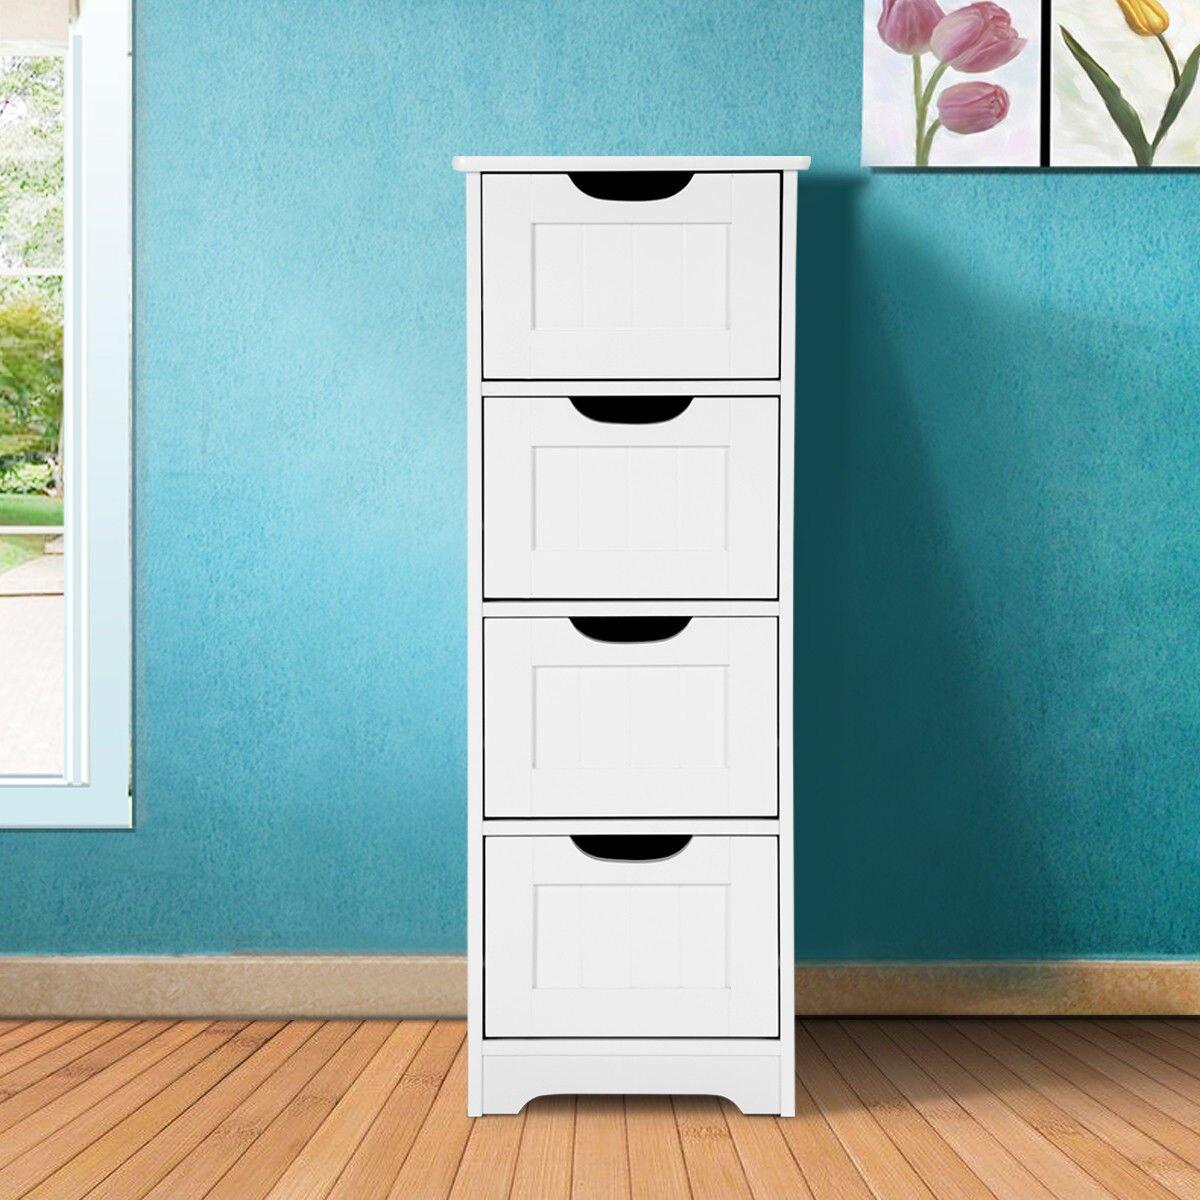 Costway Costway White Floor Storage Cabinet Bathroom Organizer Free Standing 234 Drawers Rakuten inside size 1200 X 1200